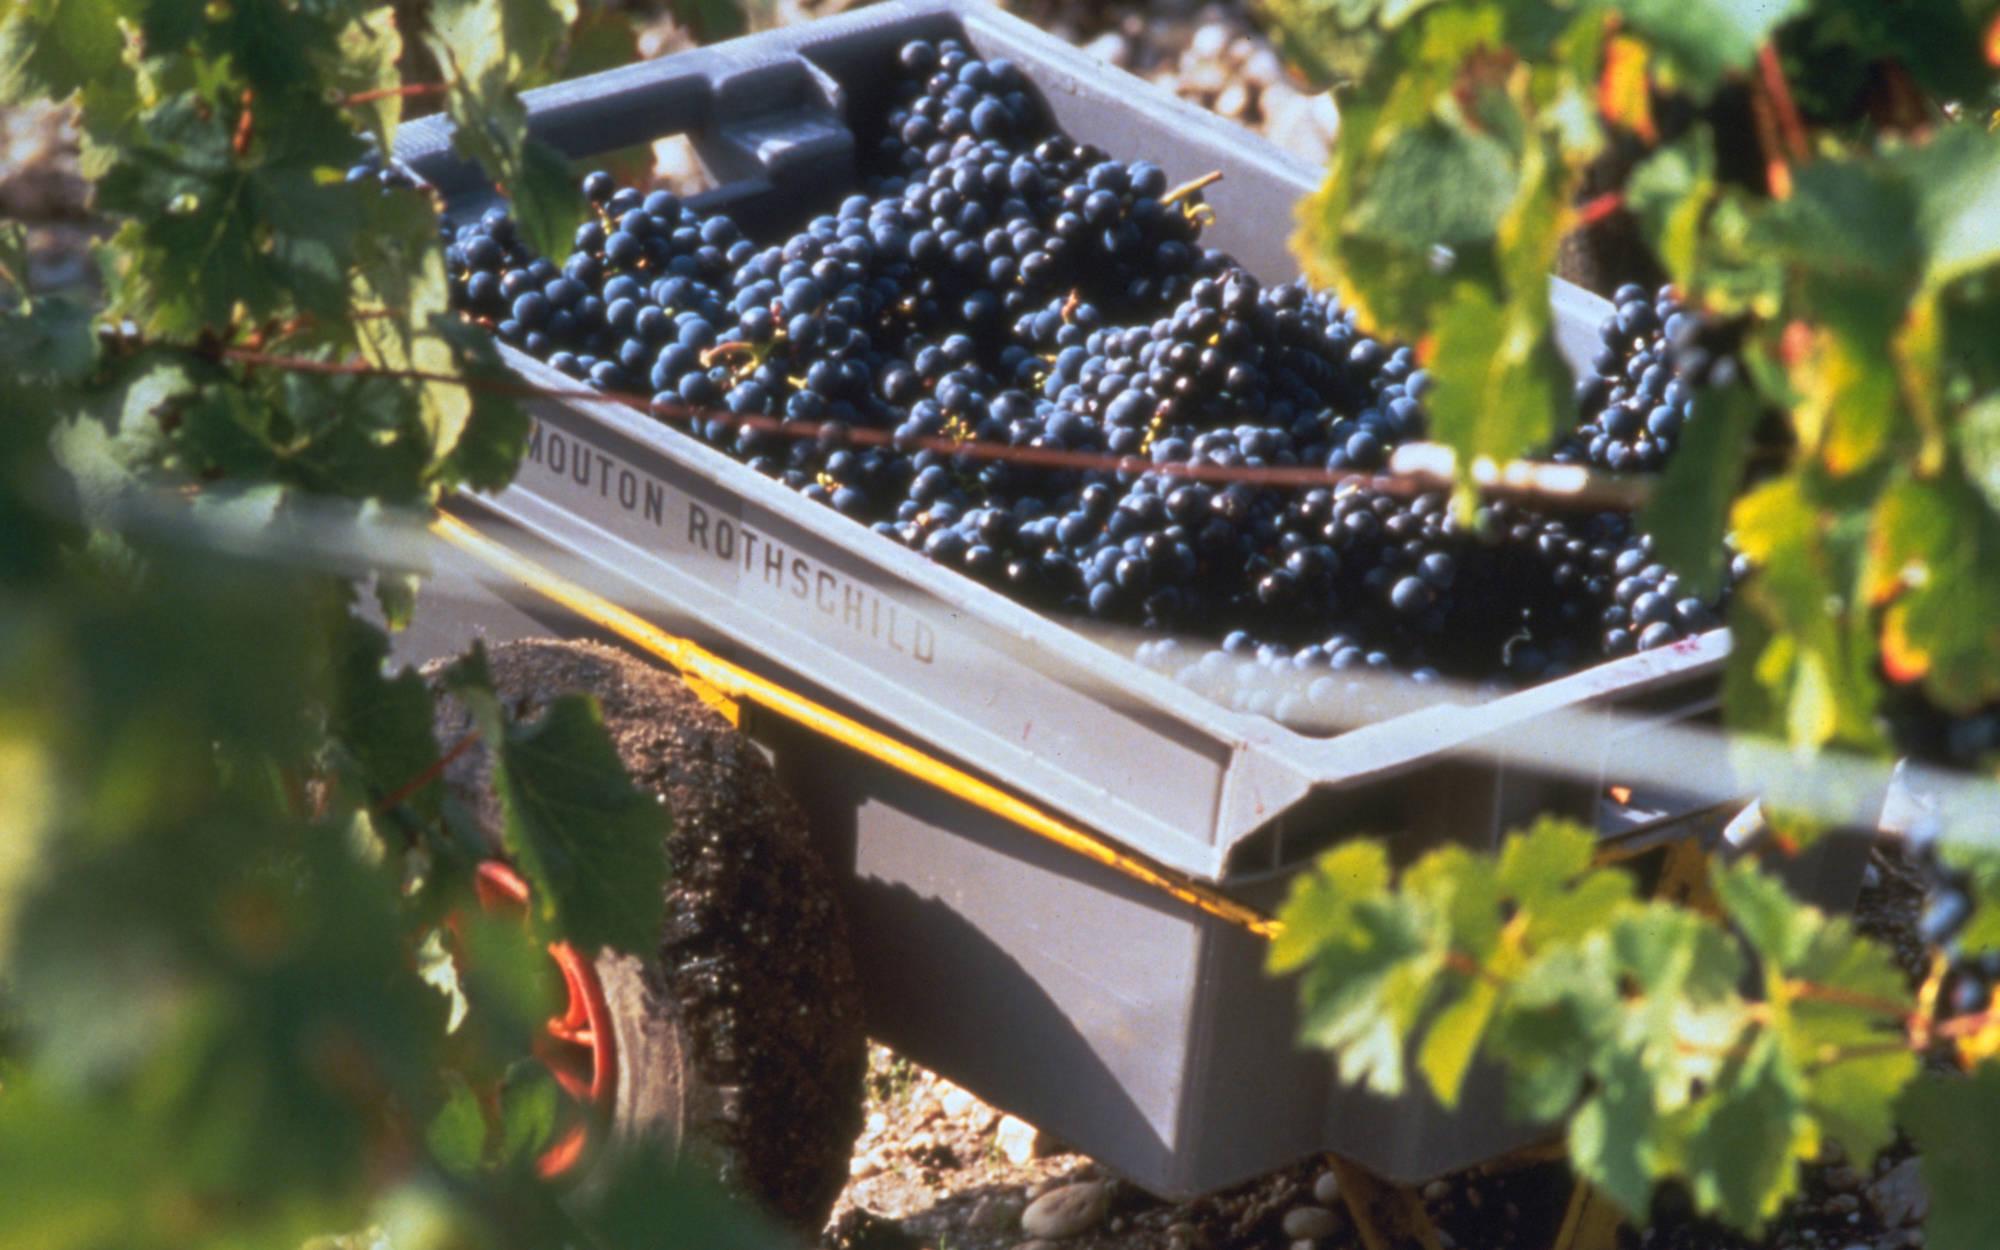 Grape harvest at Mouthon Rothschild